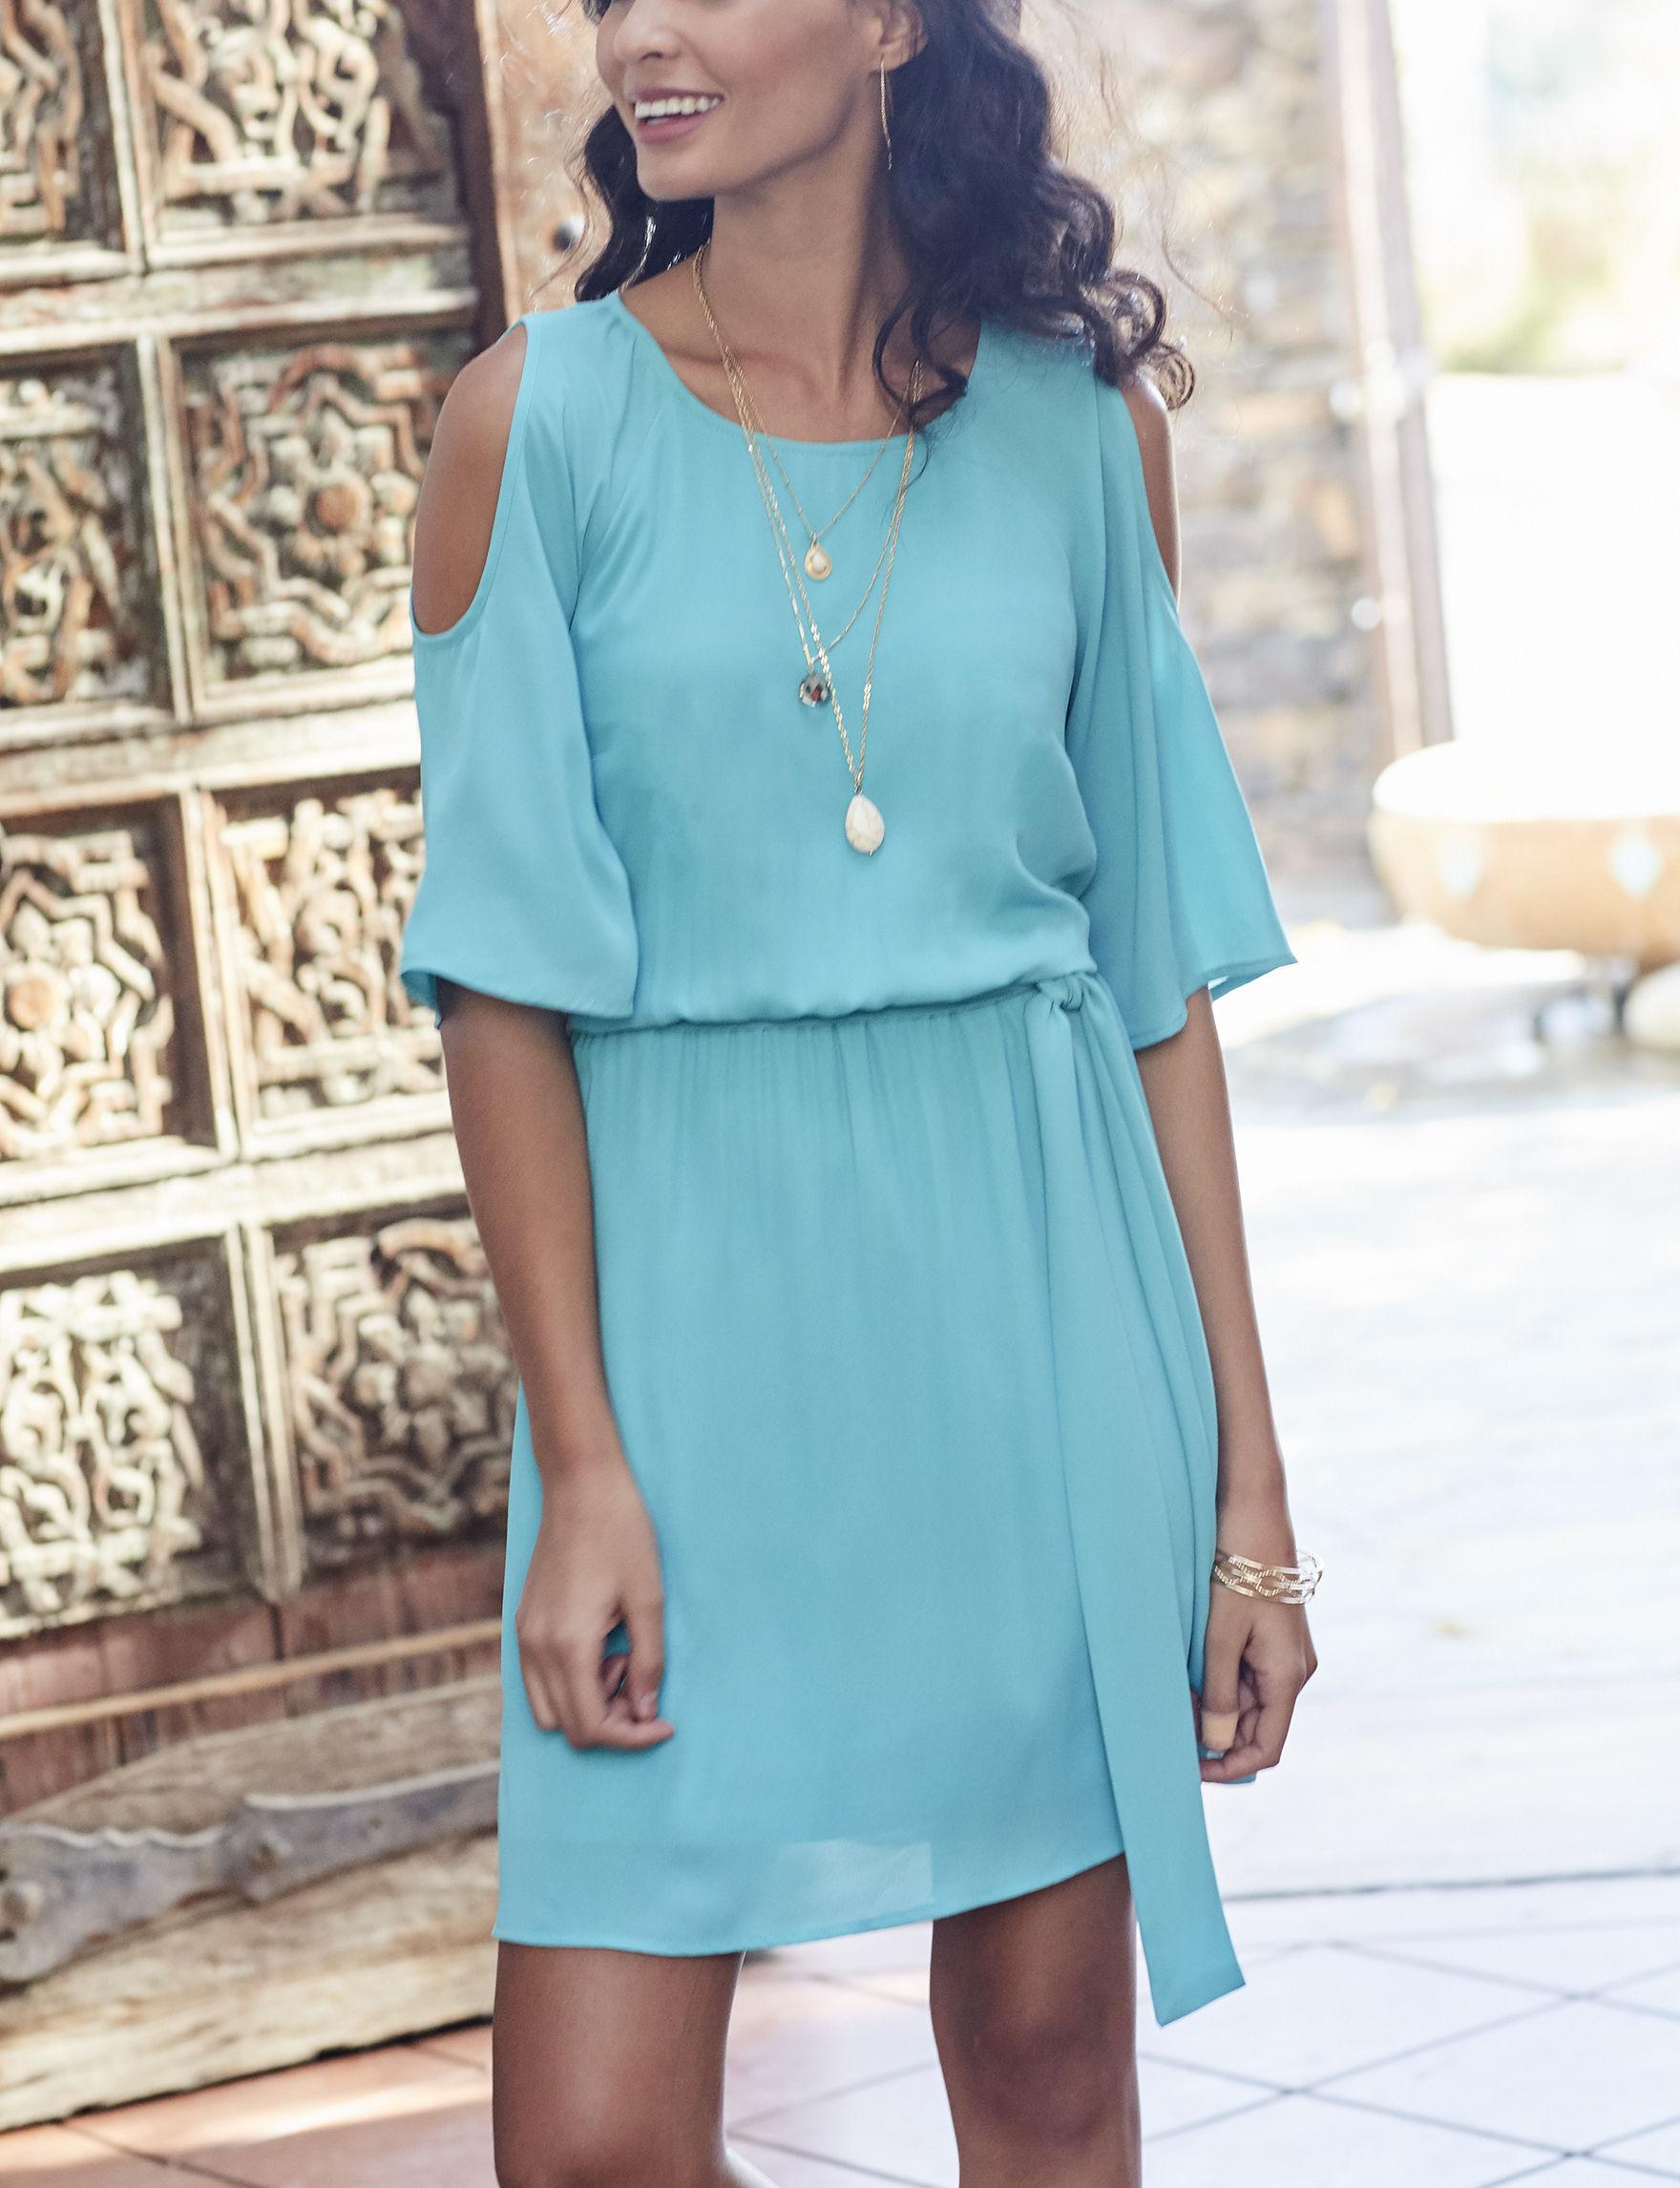 Signature Studio Blue Everyday & Casual Fit & Flare Dresses